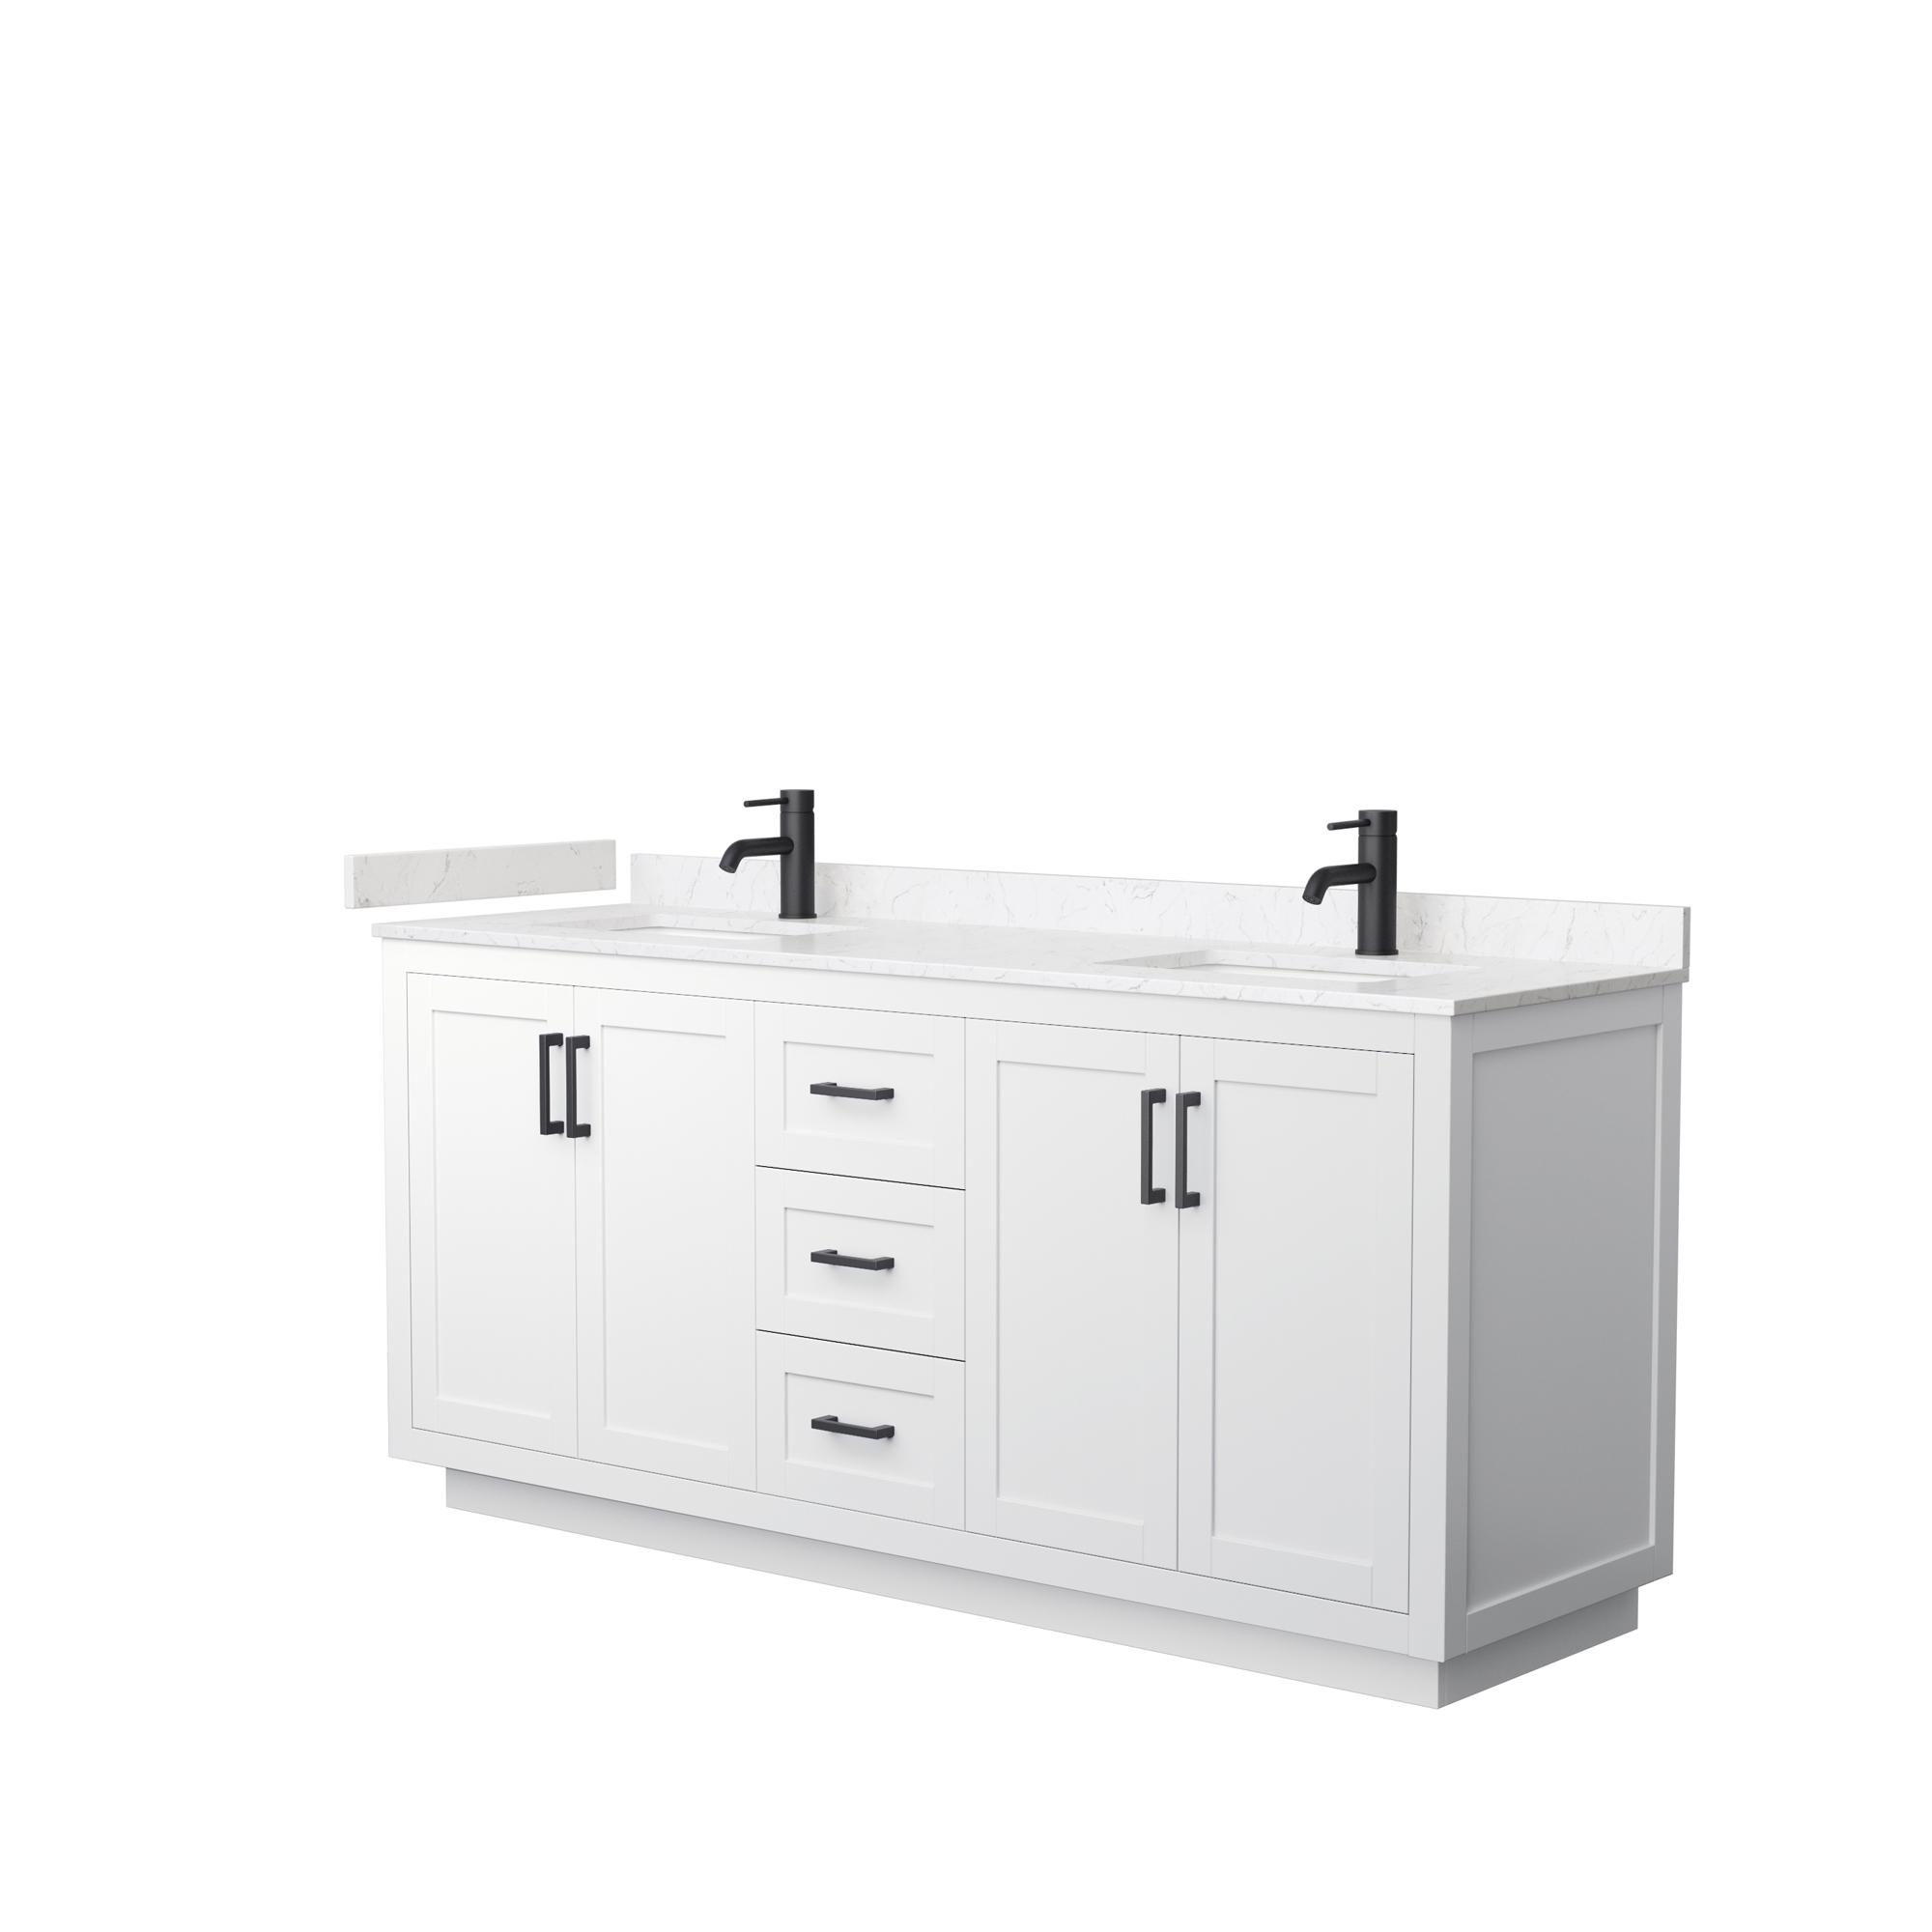 "72"" Double Bathroom Vanity in White, Light-Vein Carrara Cultured Marble Countertop, Undermount Square Sinks, Matte Black Trim"